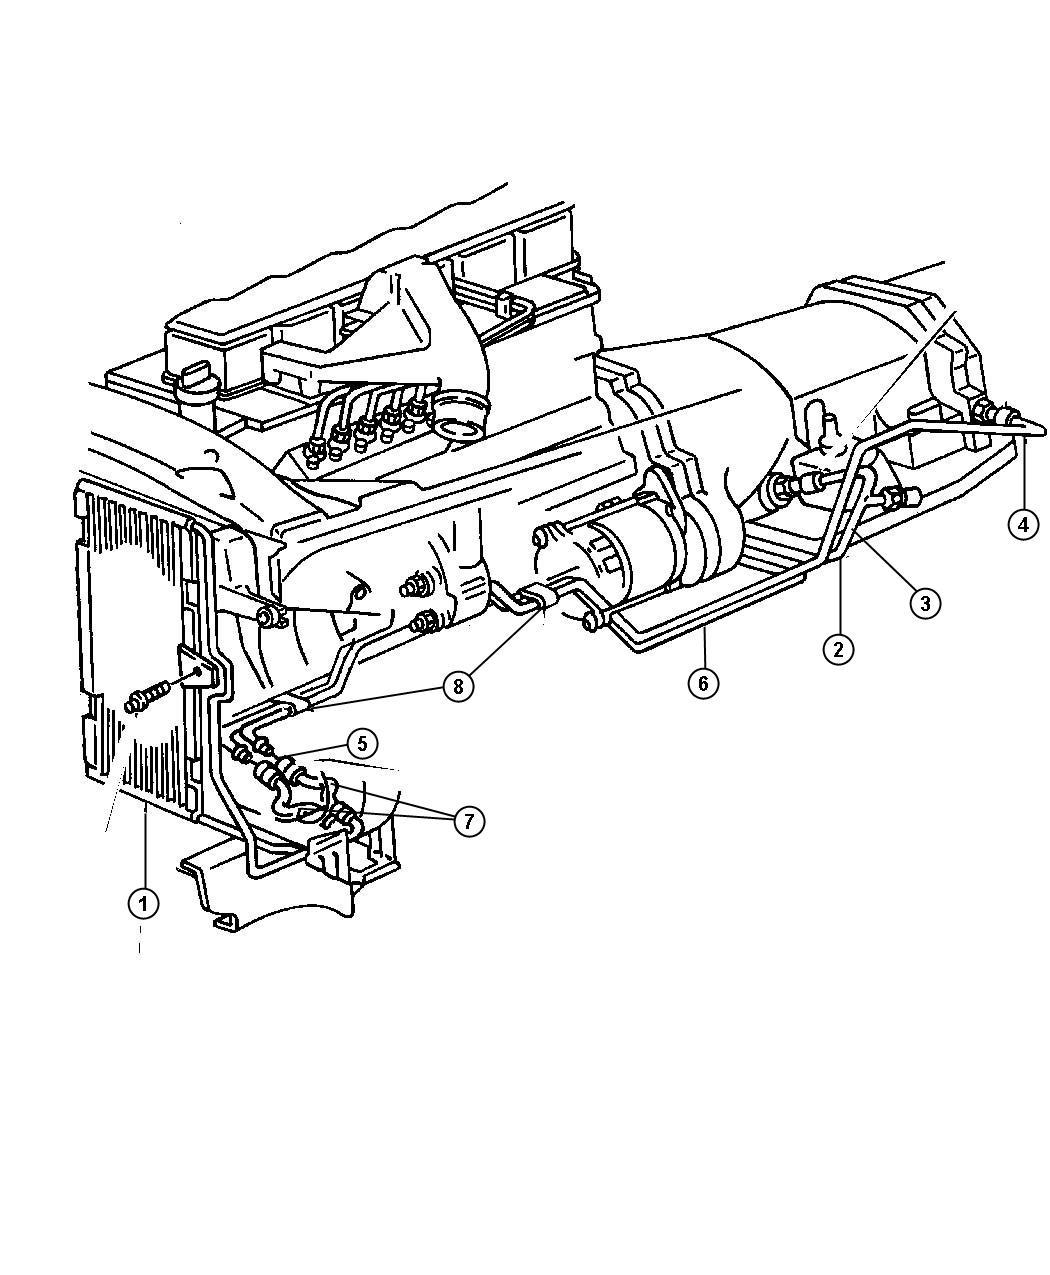 Dodge Ram Tube Oil Cooler 5 9l I6 Cummins